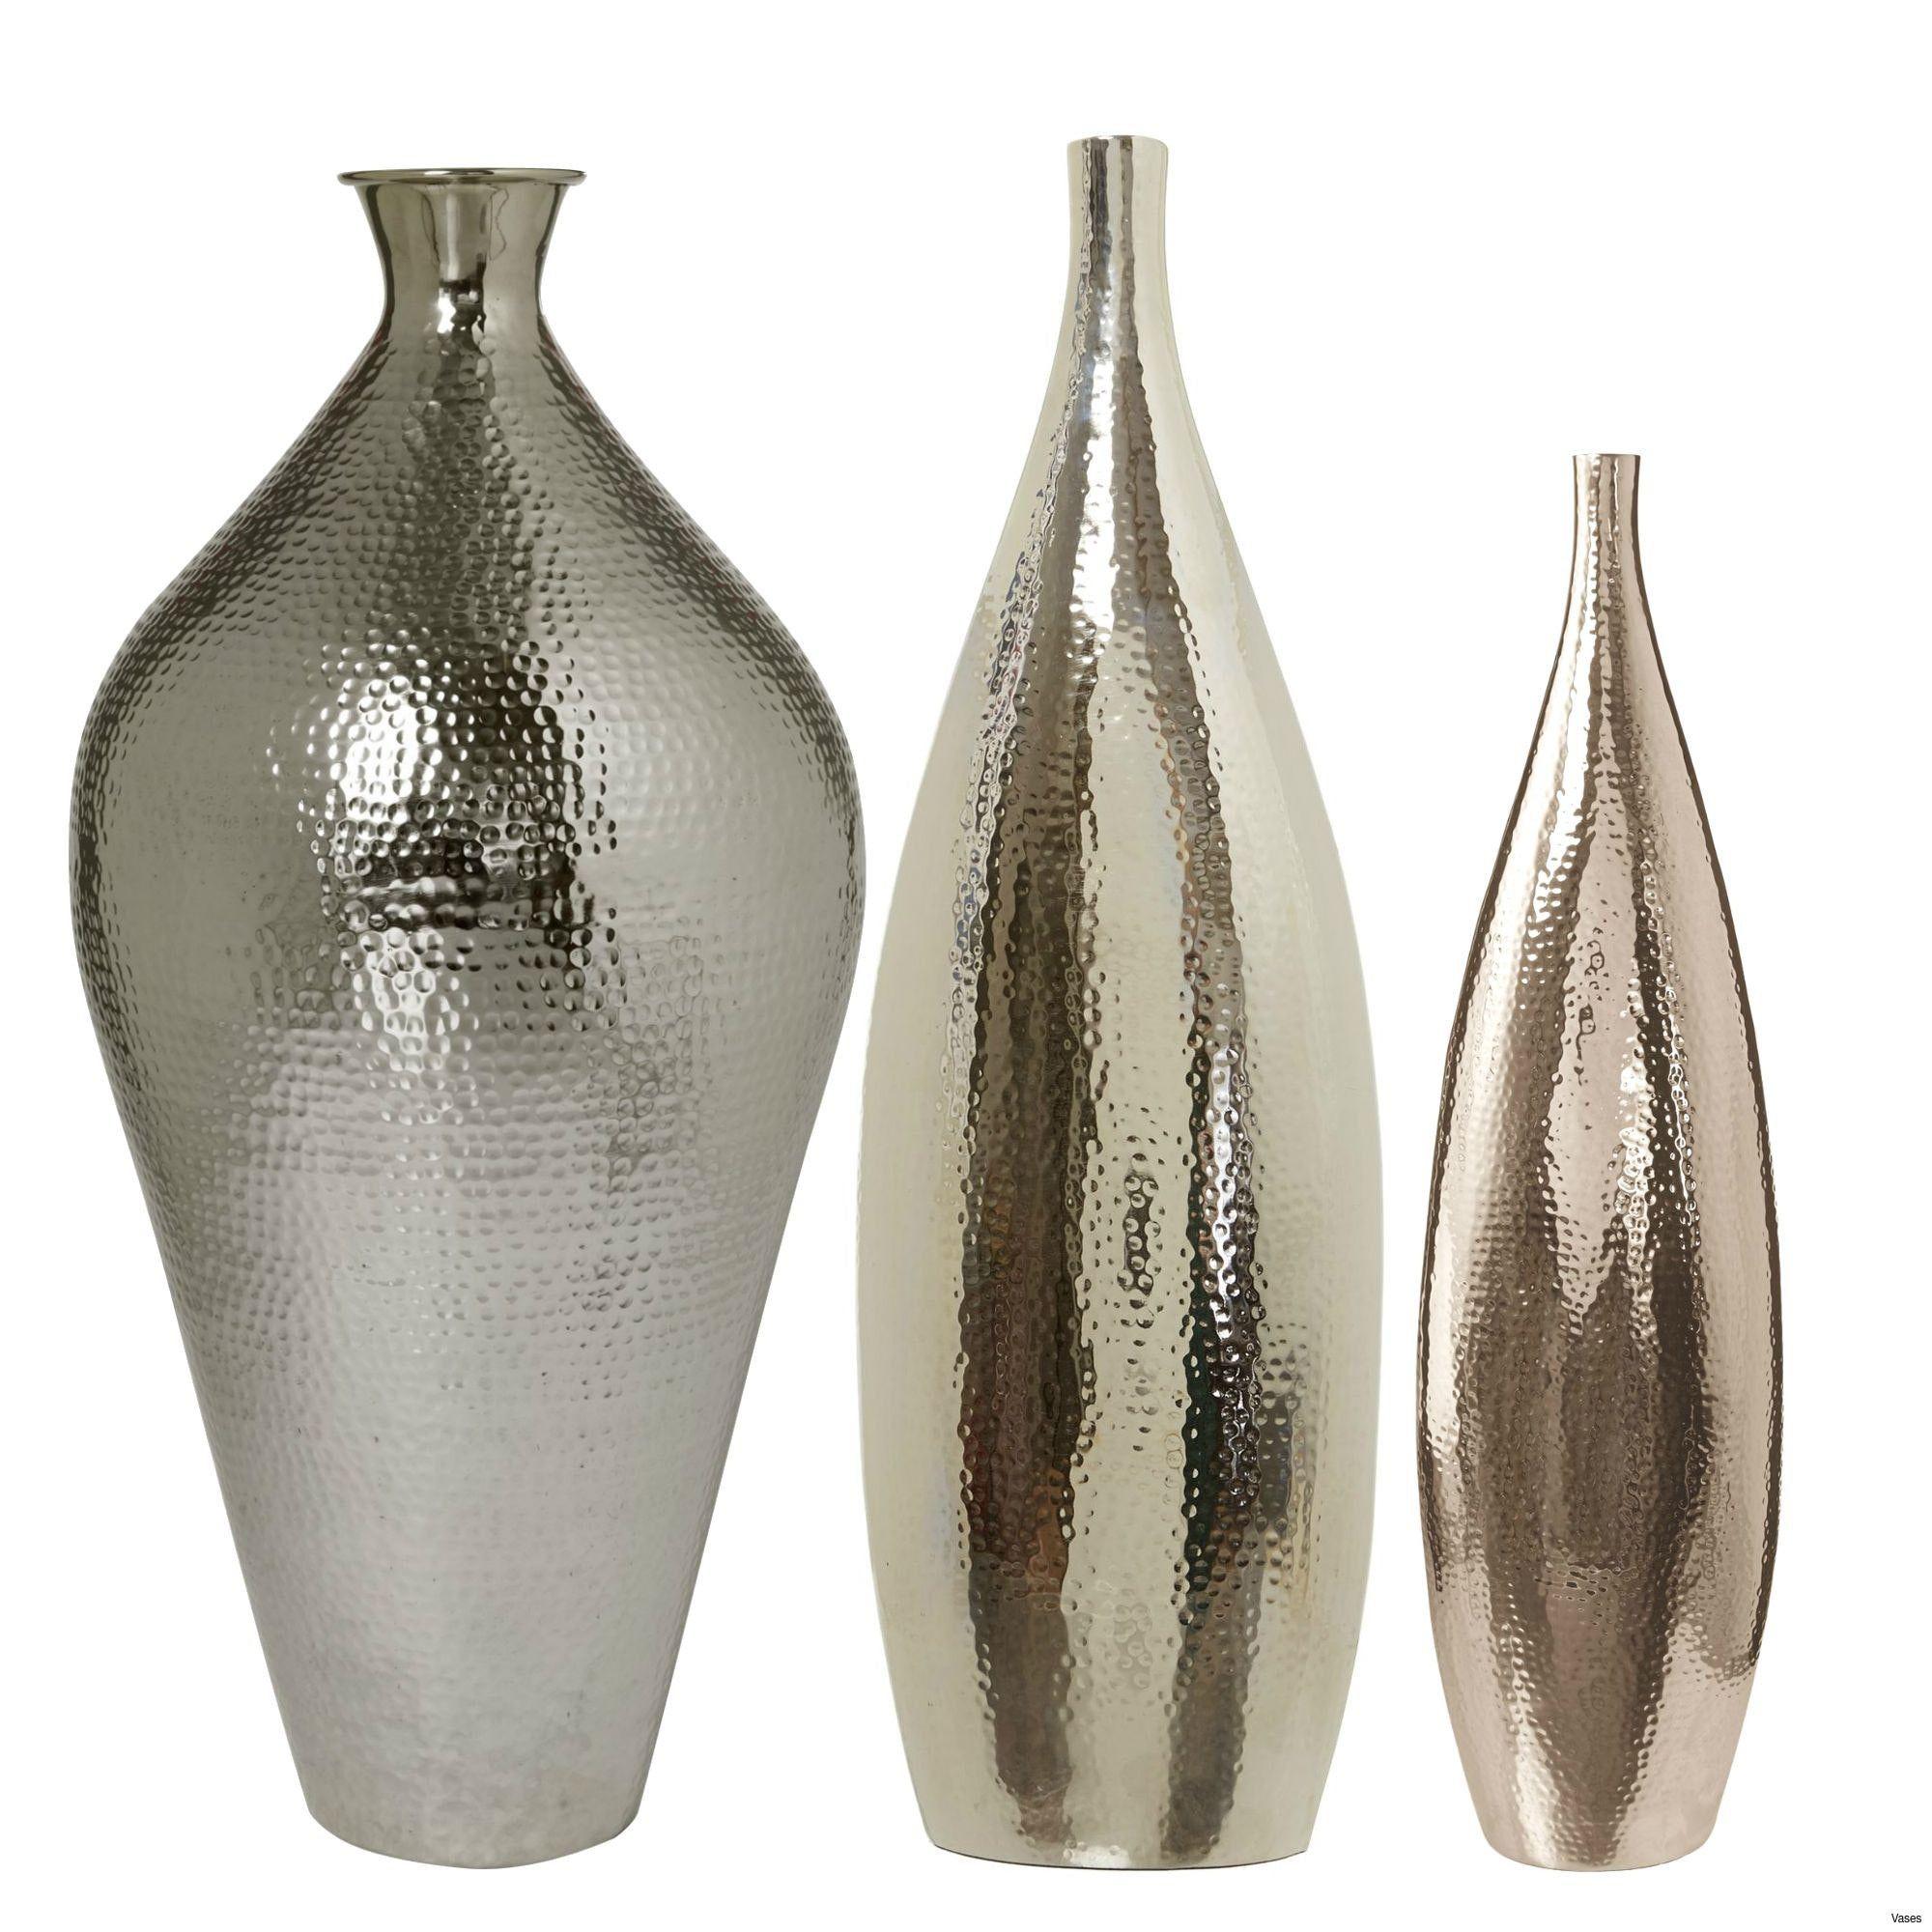 floor vase fillers of tall vase fillers inspirational metal vases vase and cellar image pertaining to tall vase fillers inspirational metal vases vase and cellar image avorcor